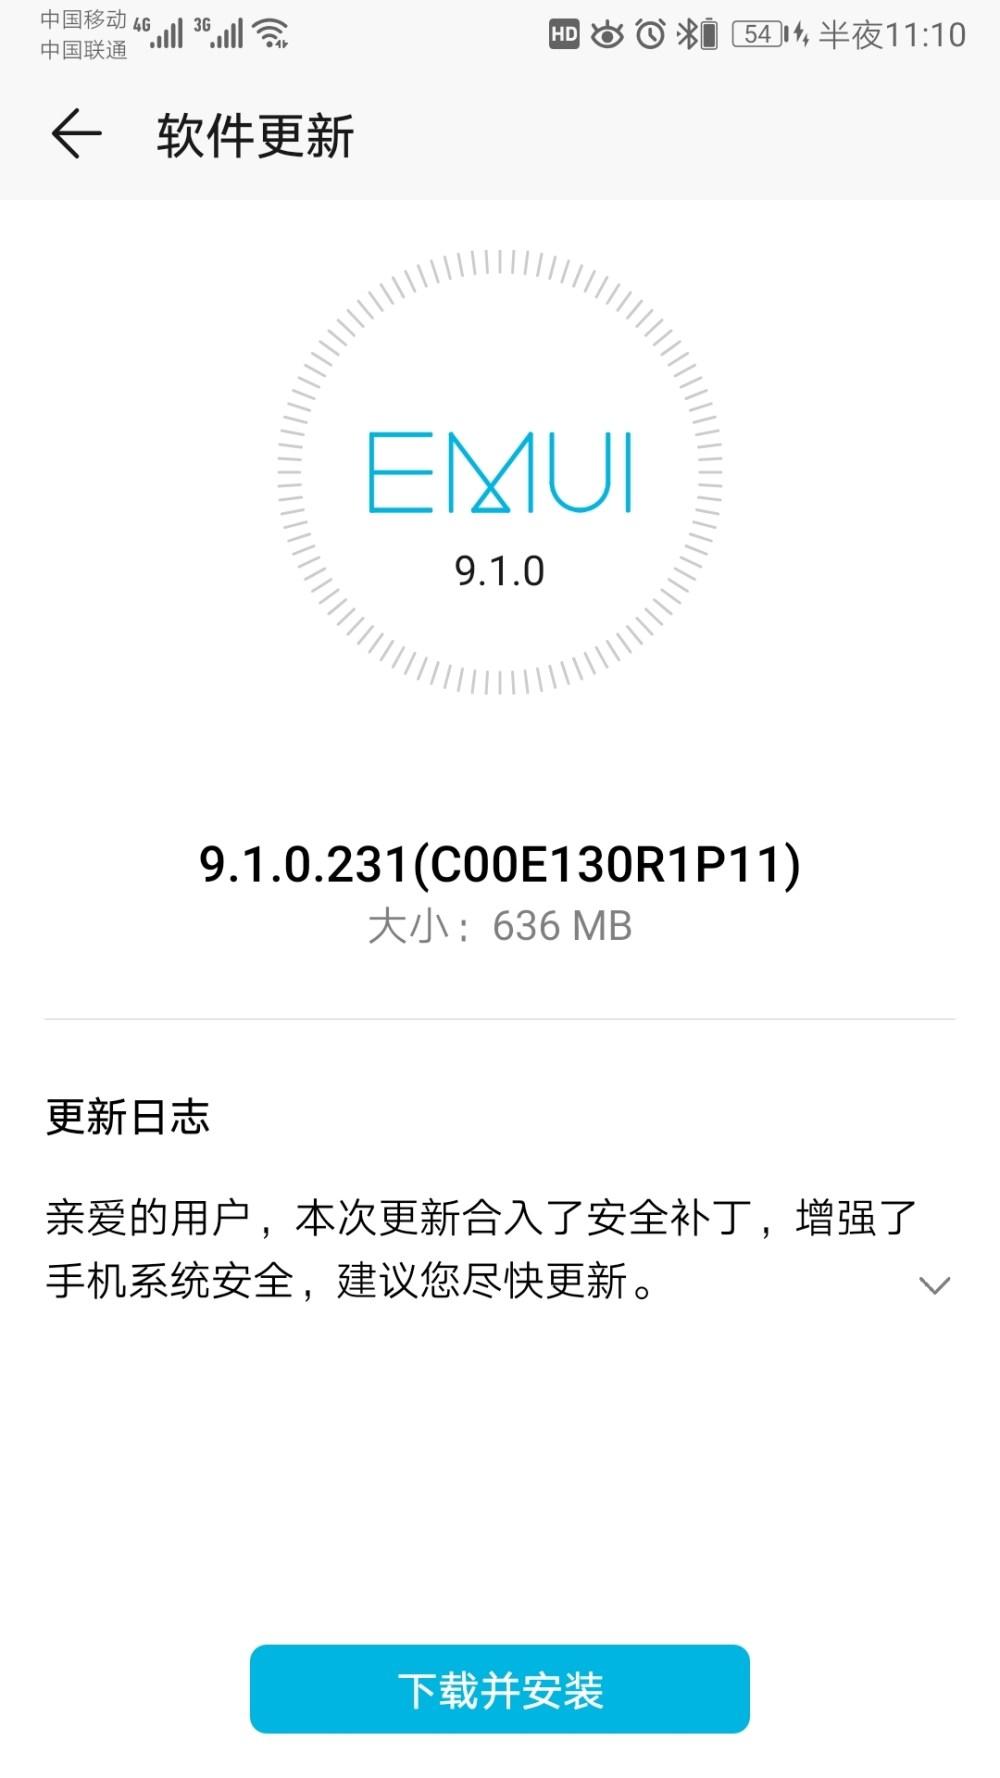 Honor 9 version EMUI 9.1.0.231